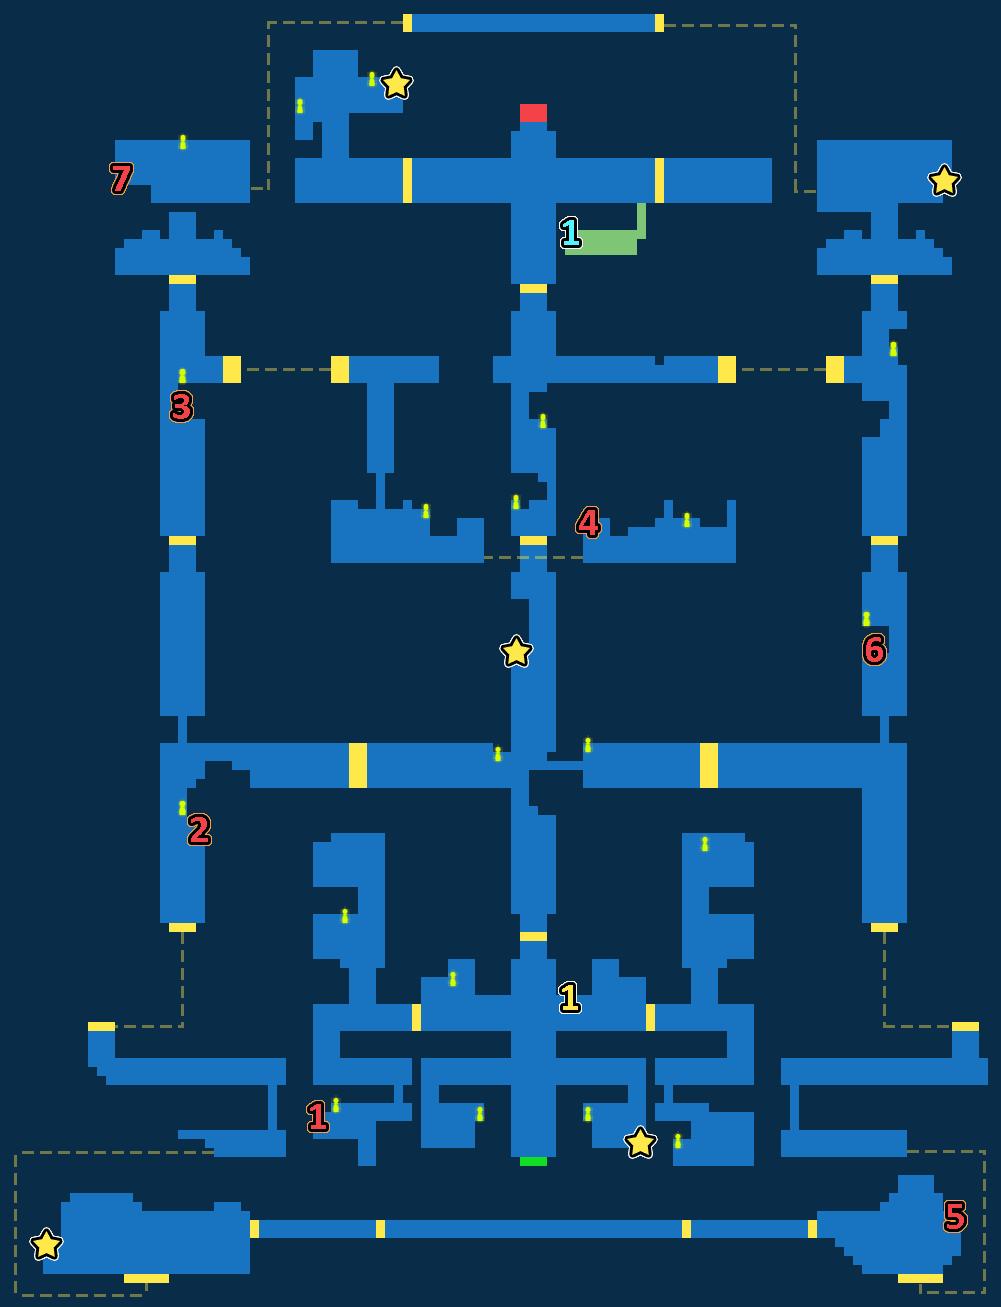 treasure_map-dwarves_forge